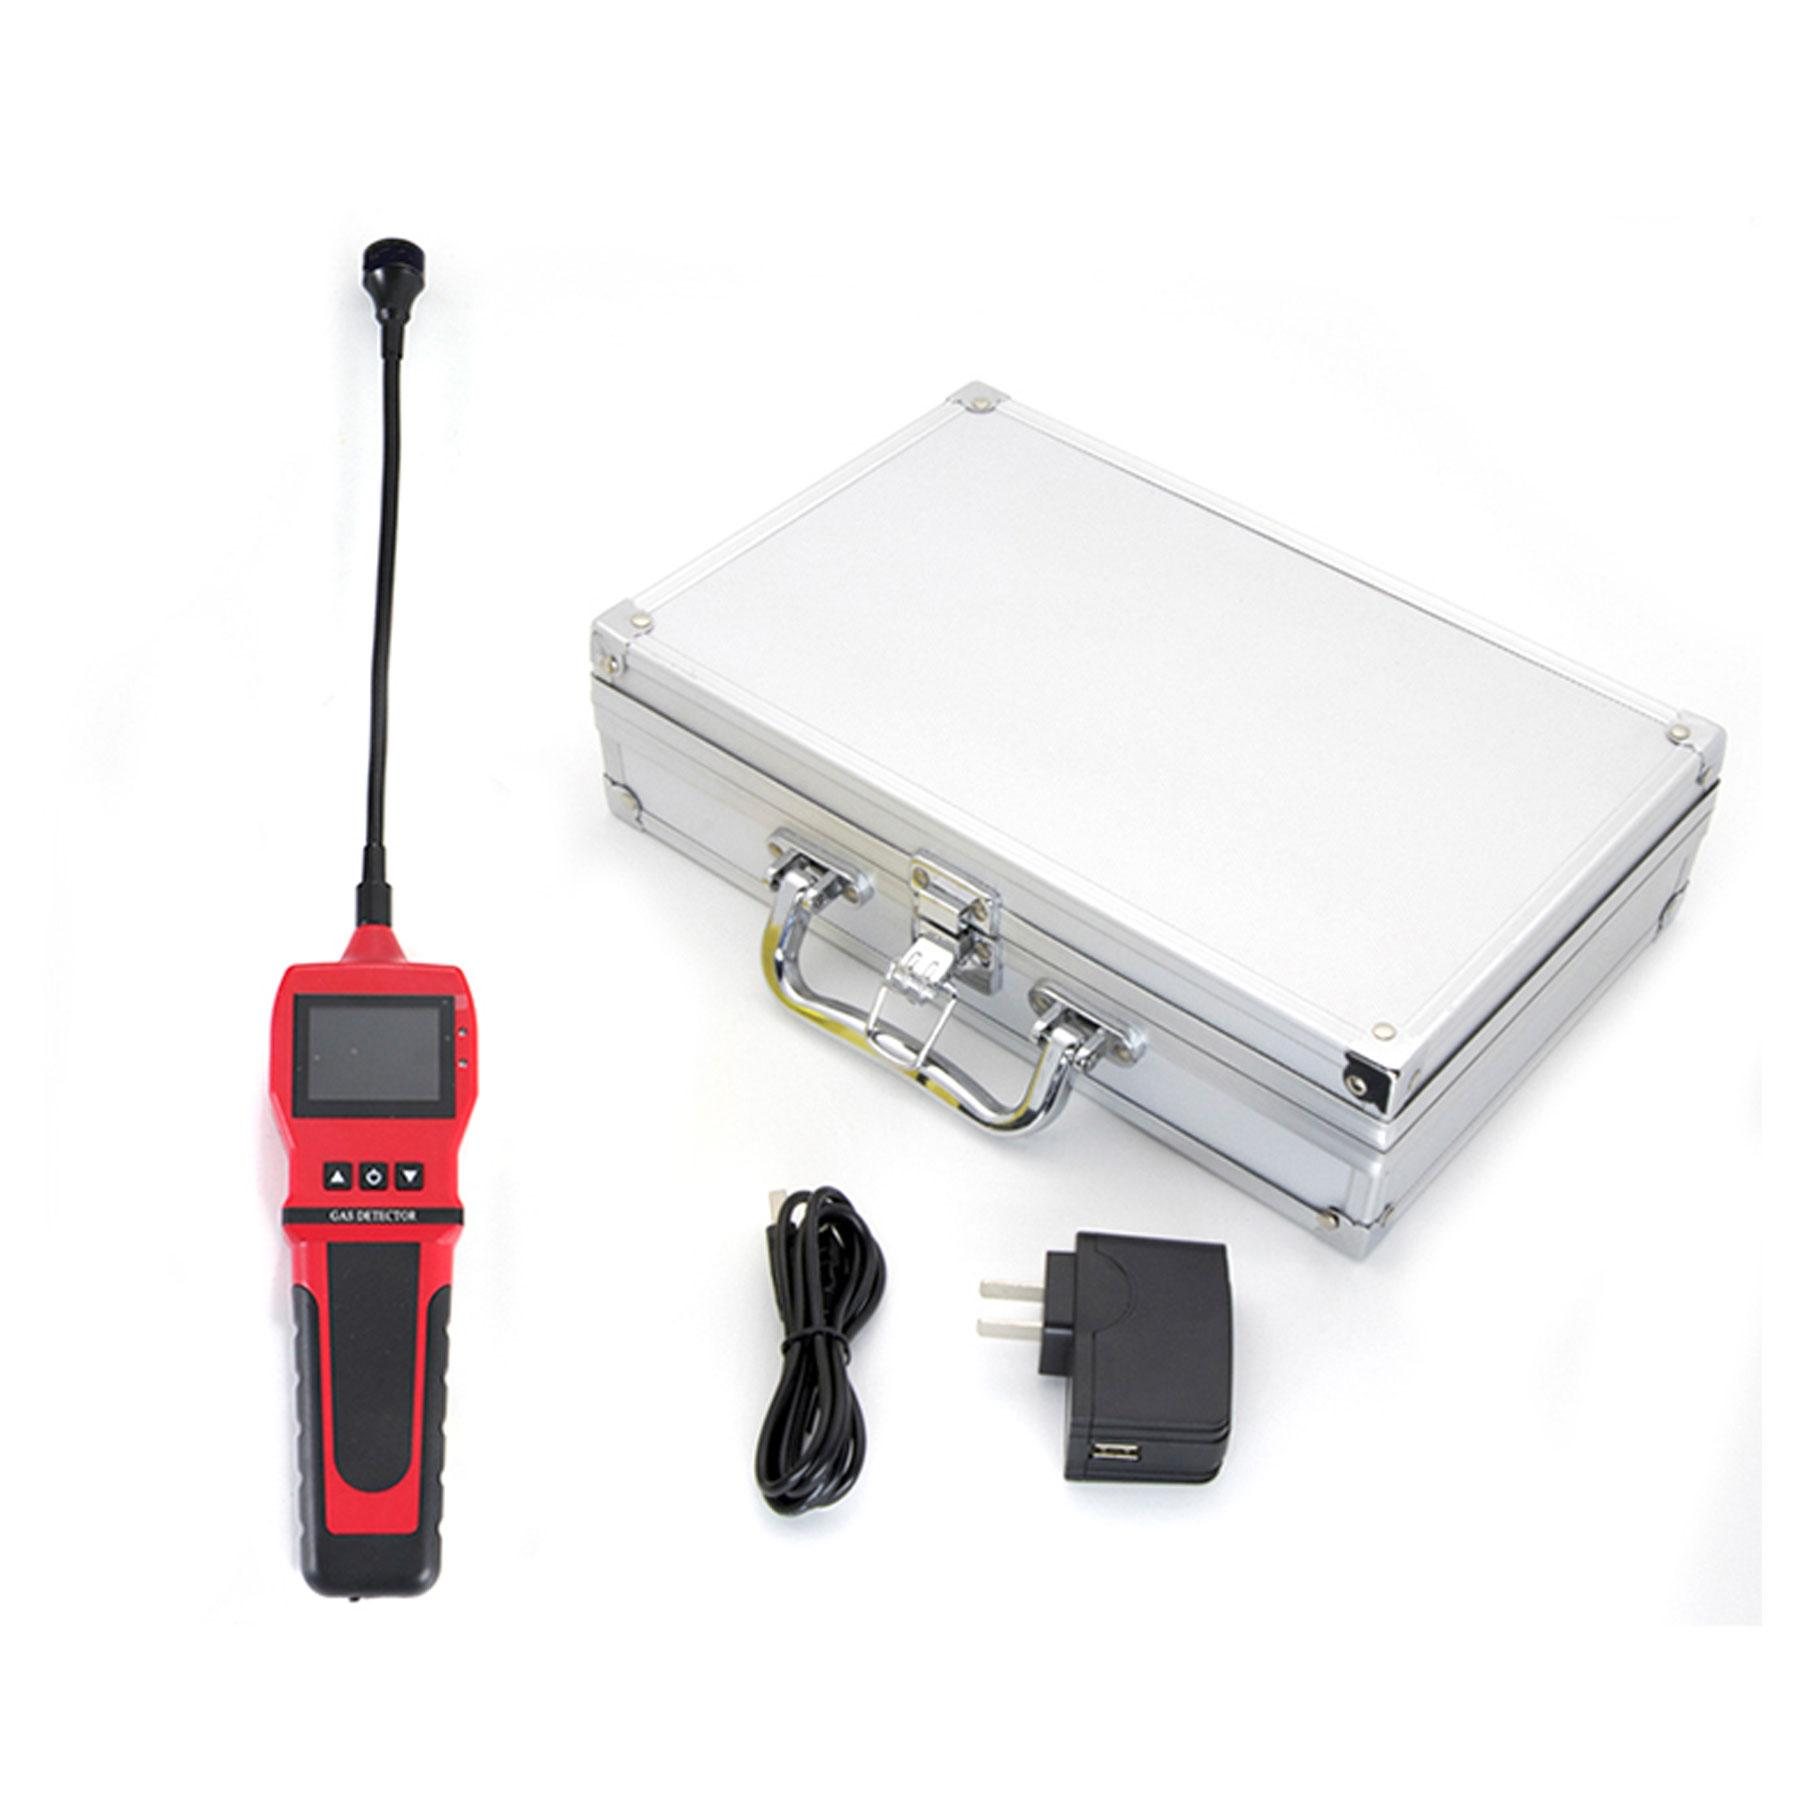 2 in 1 Gas Monitor BH-90E Refrigerant Freon Combustible Gas LPG CH4 Gas Analyzer 6